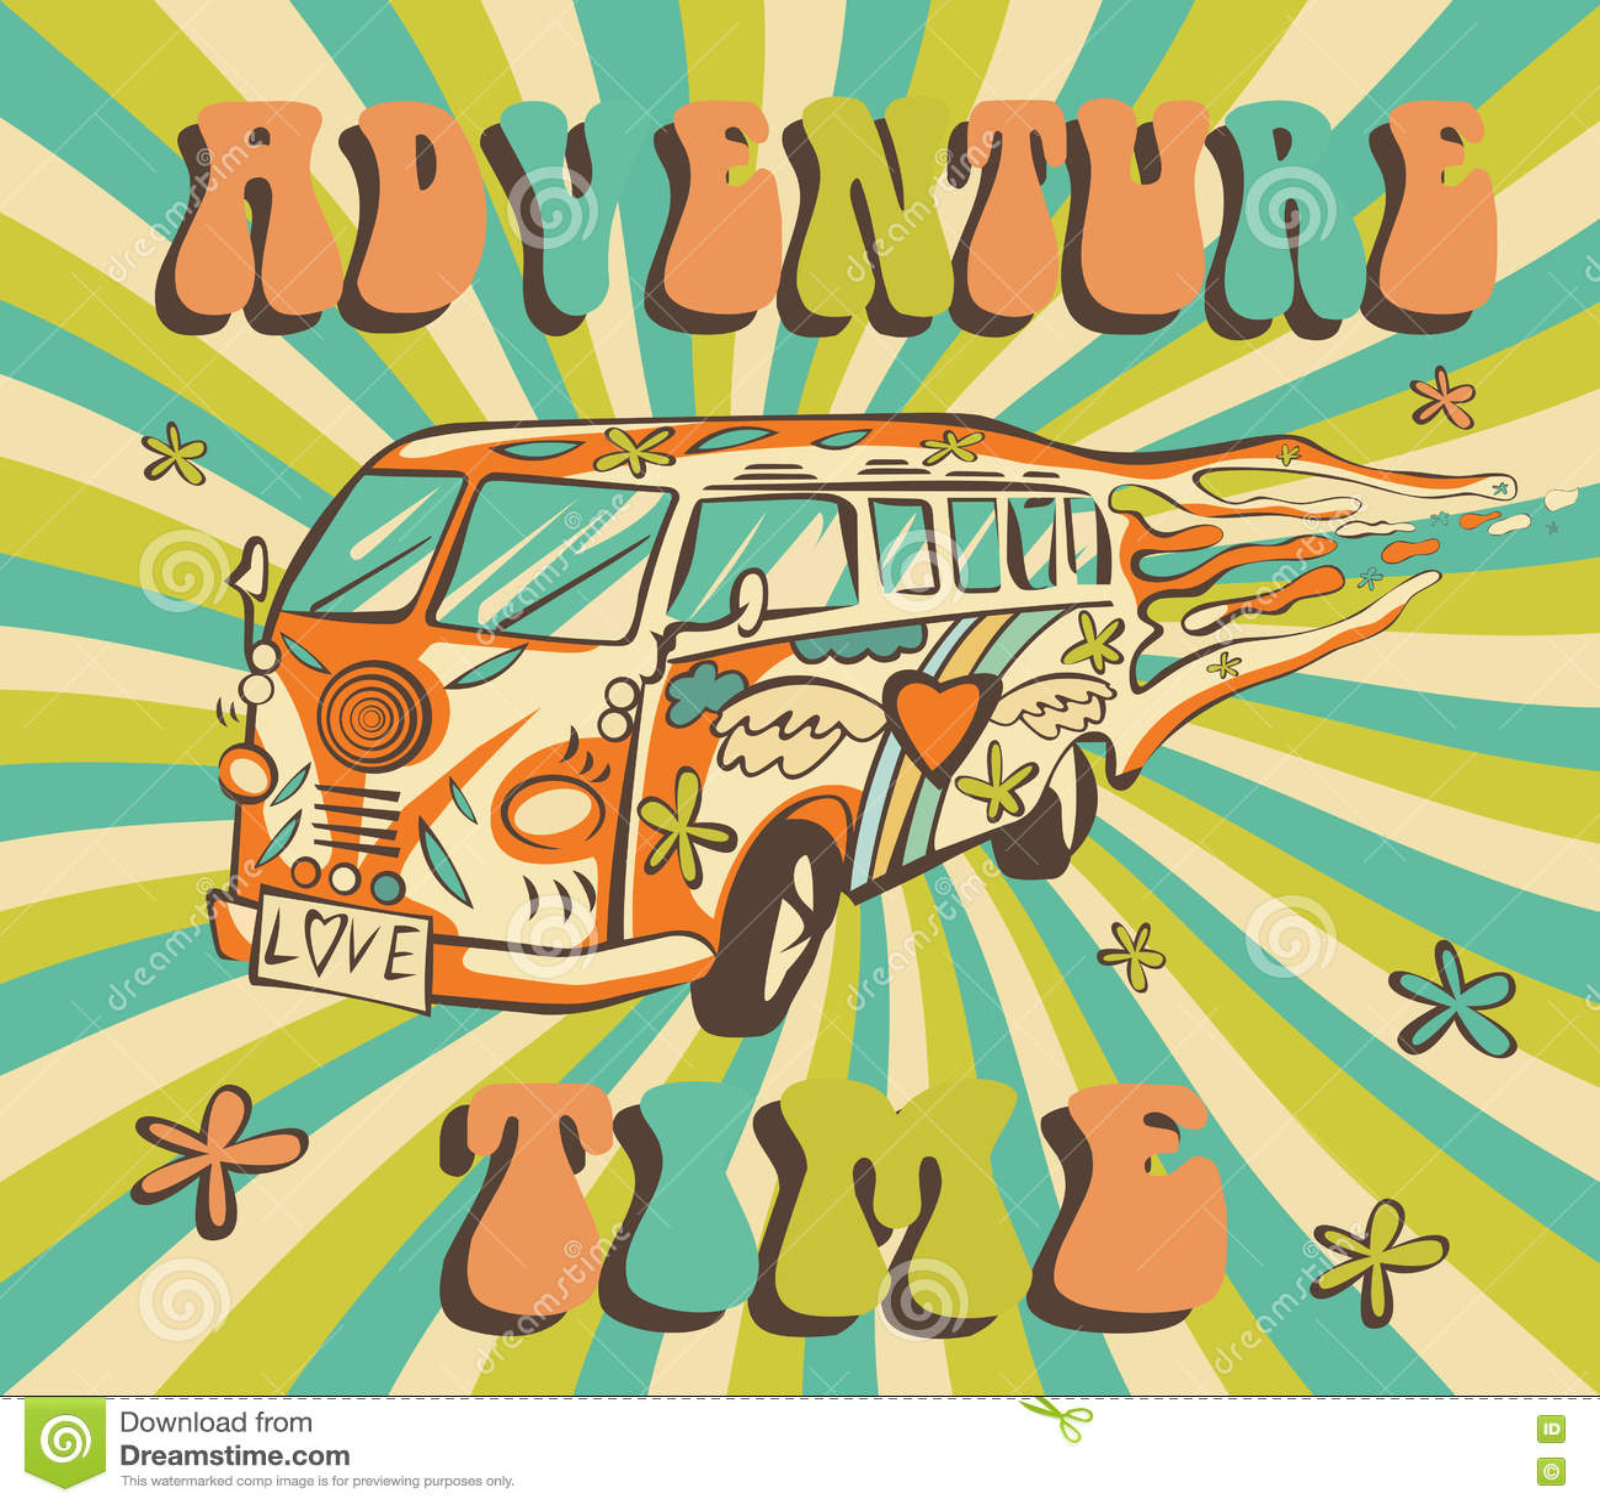 Summer Time Background With Hippie Van Vector Illustration